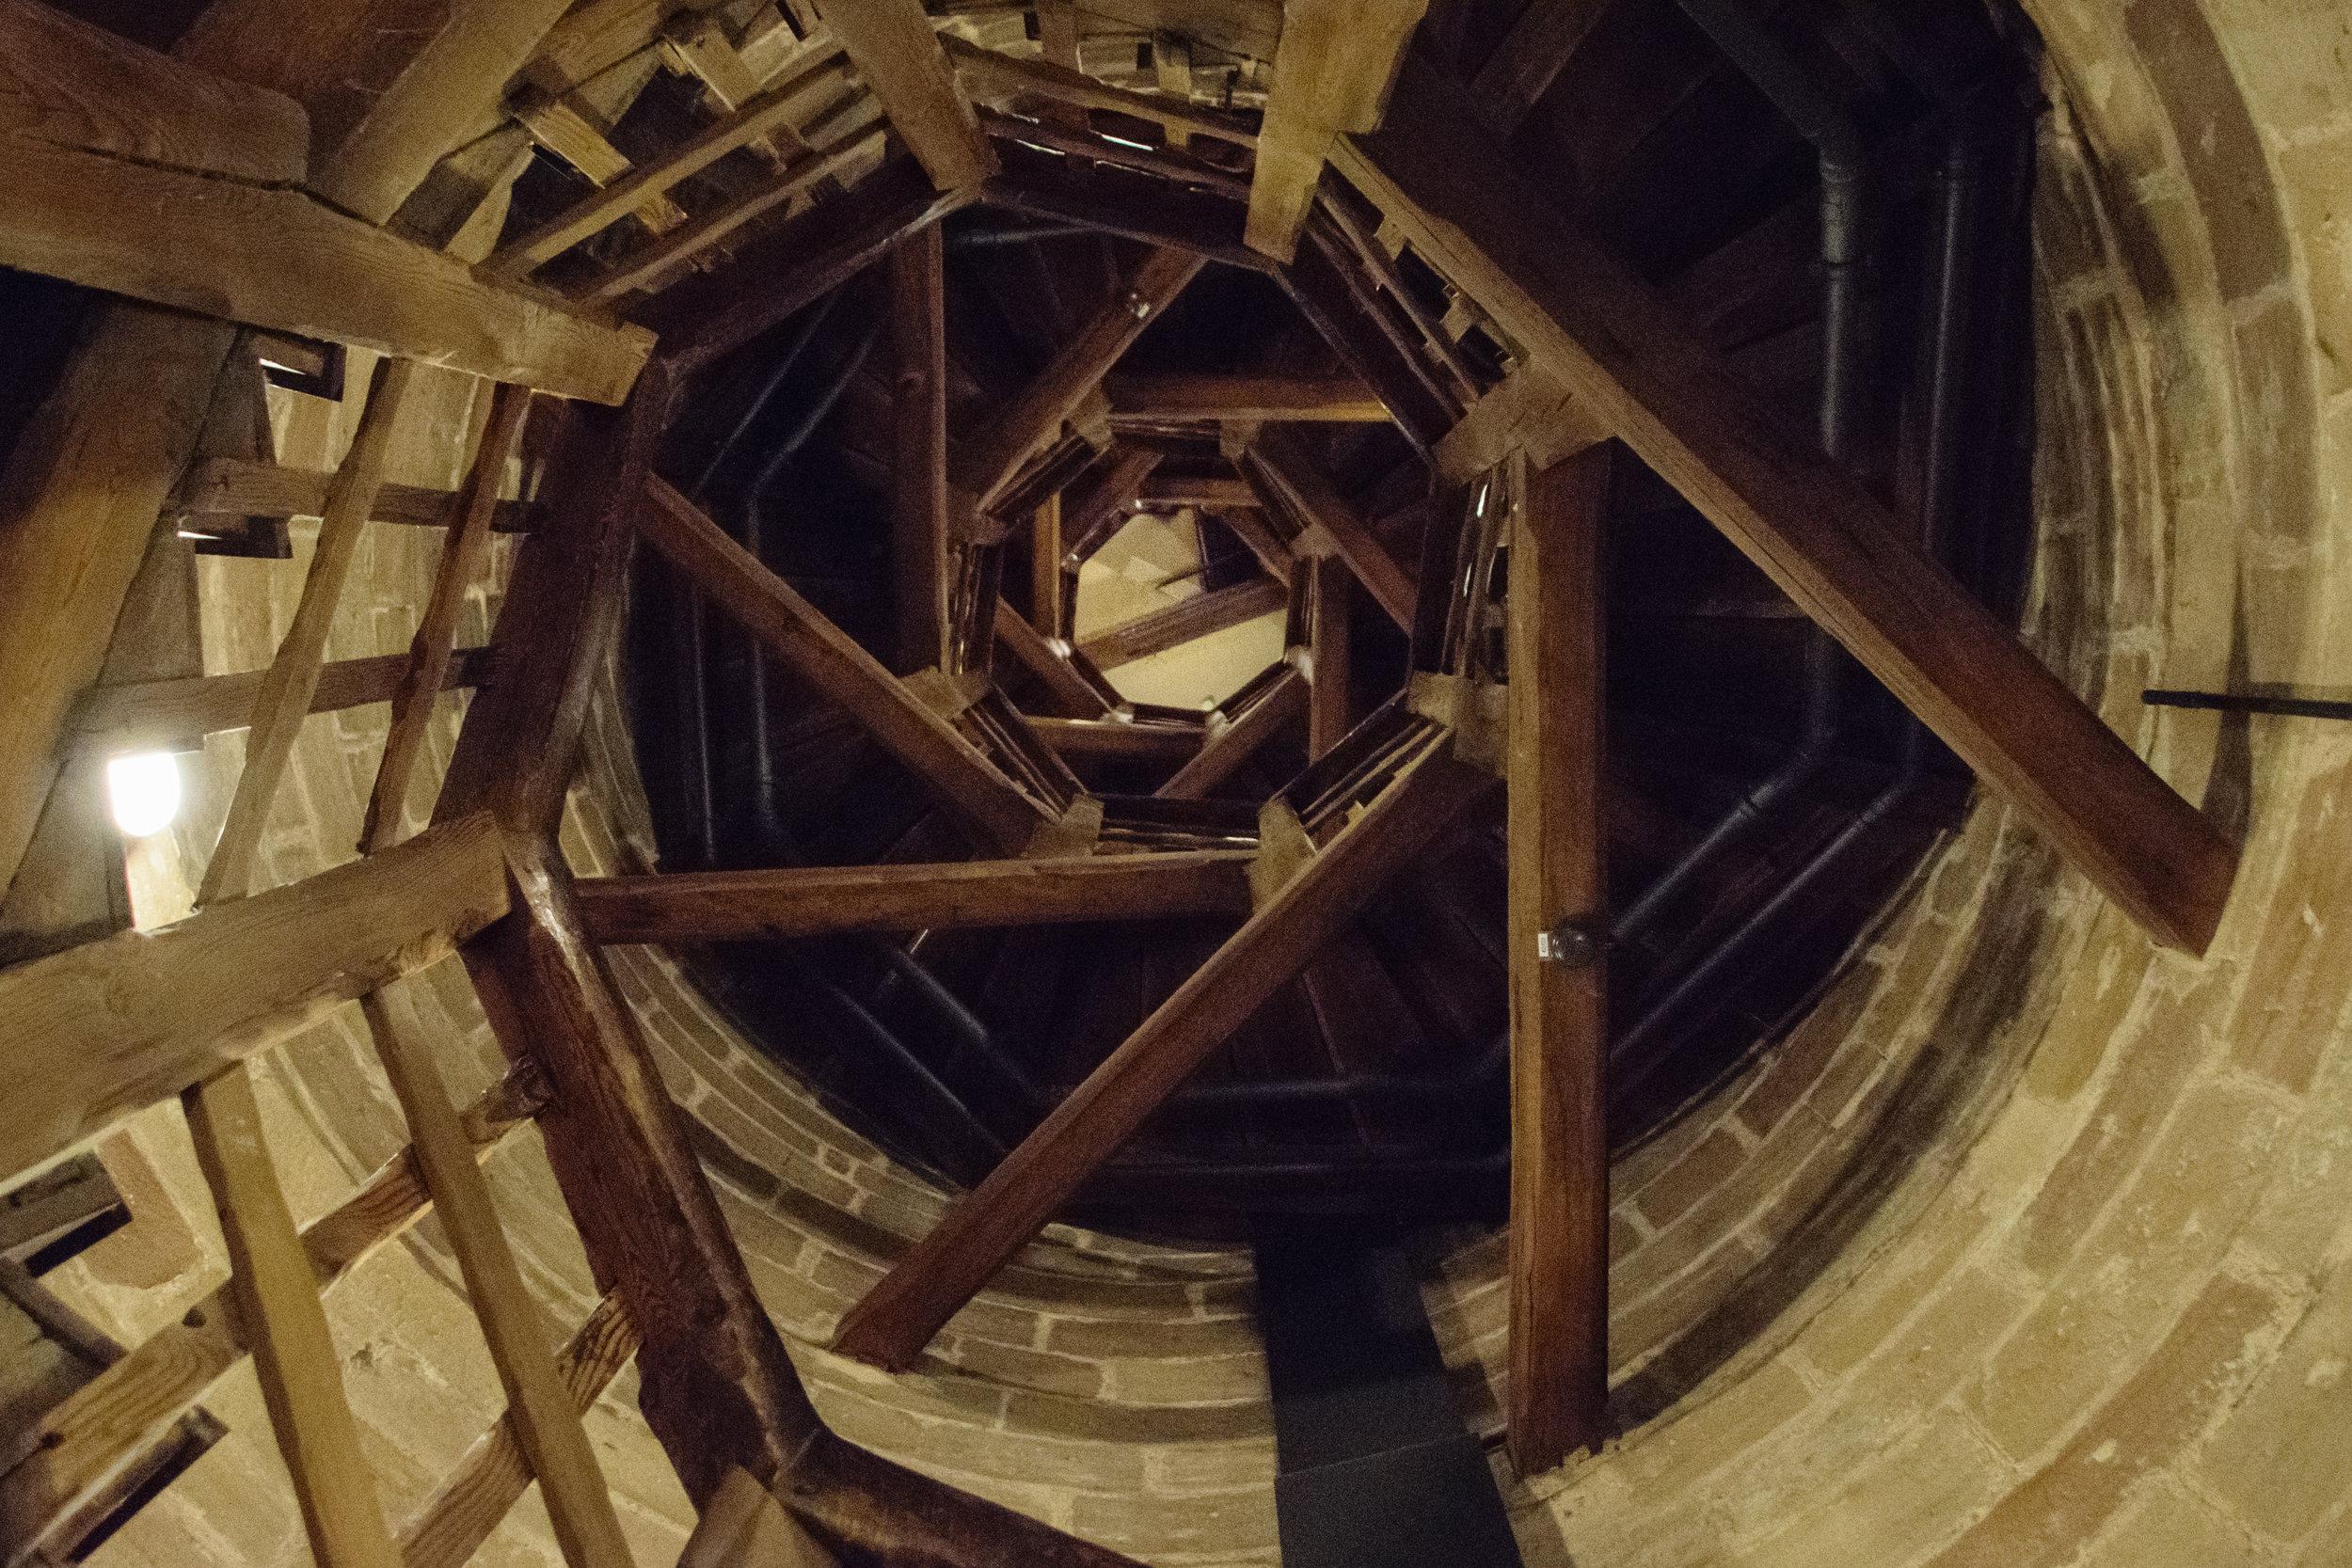 preparing to climb the tower